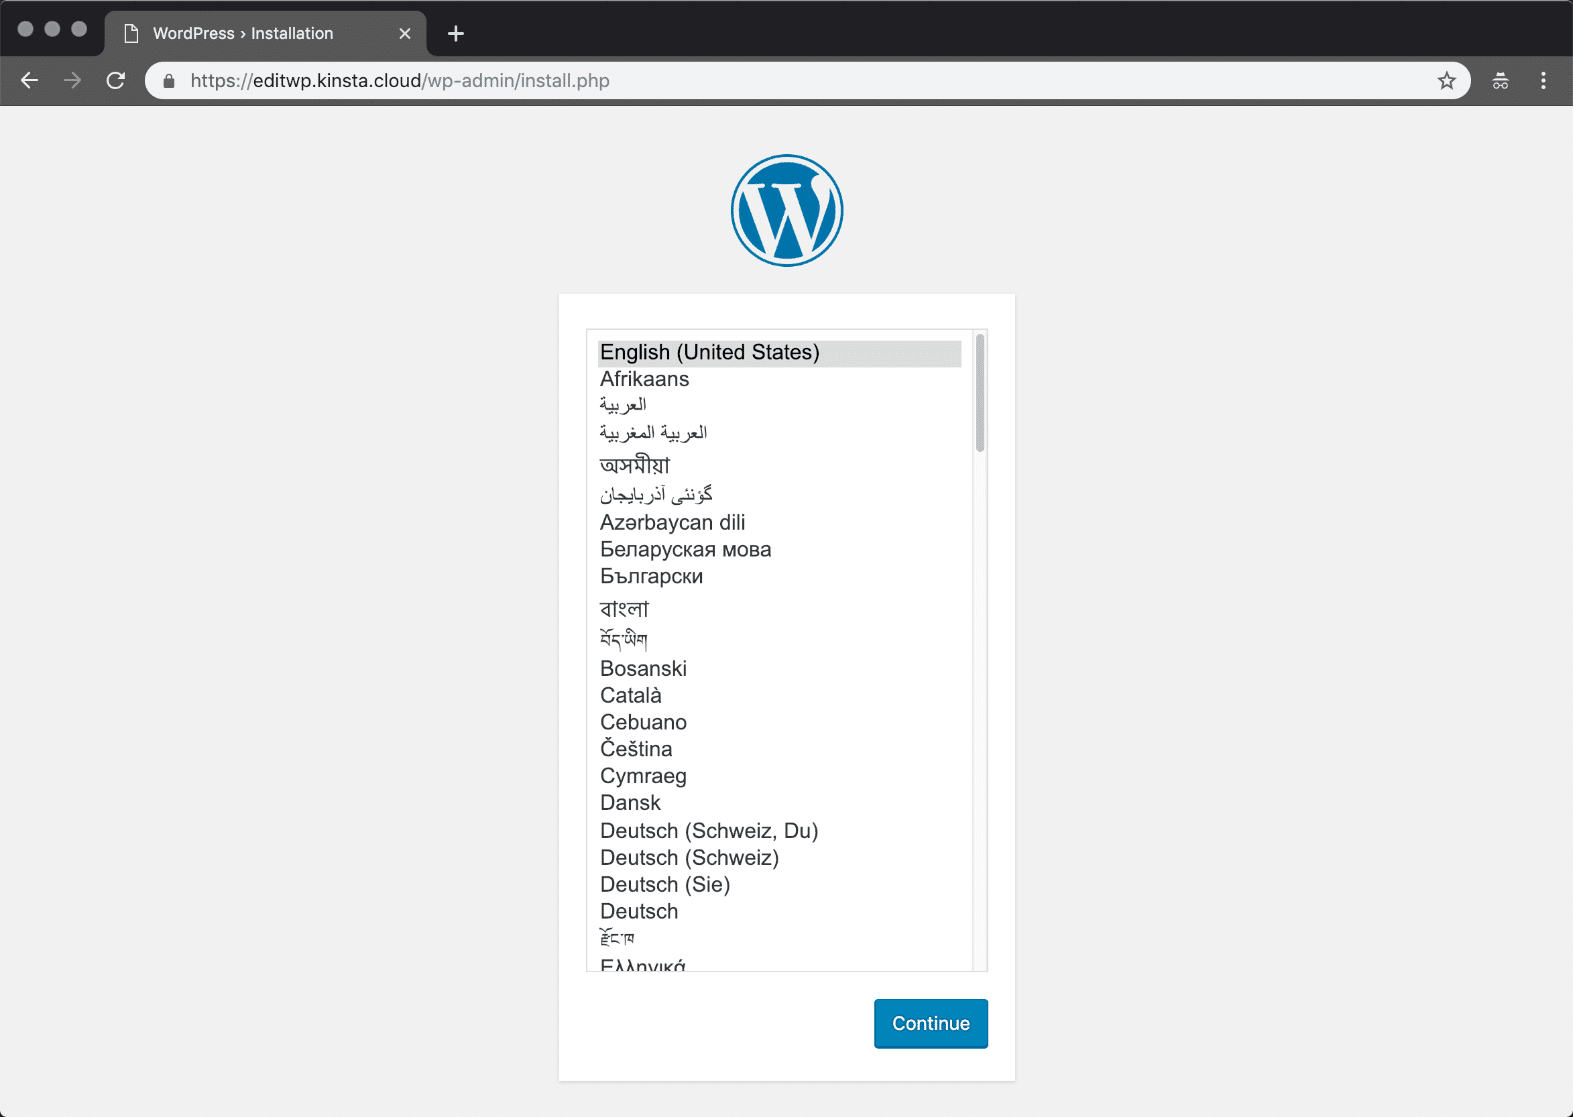 WordPress installerings-språk